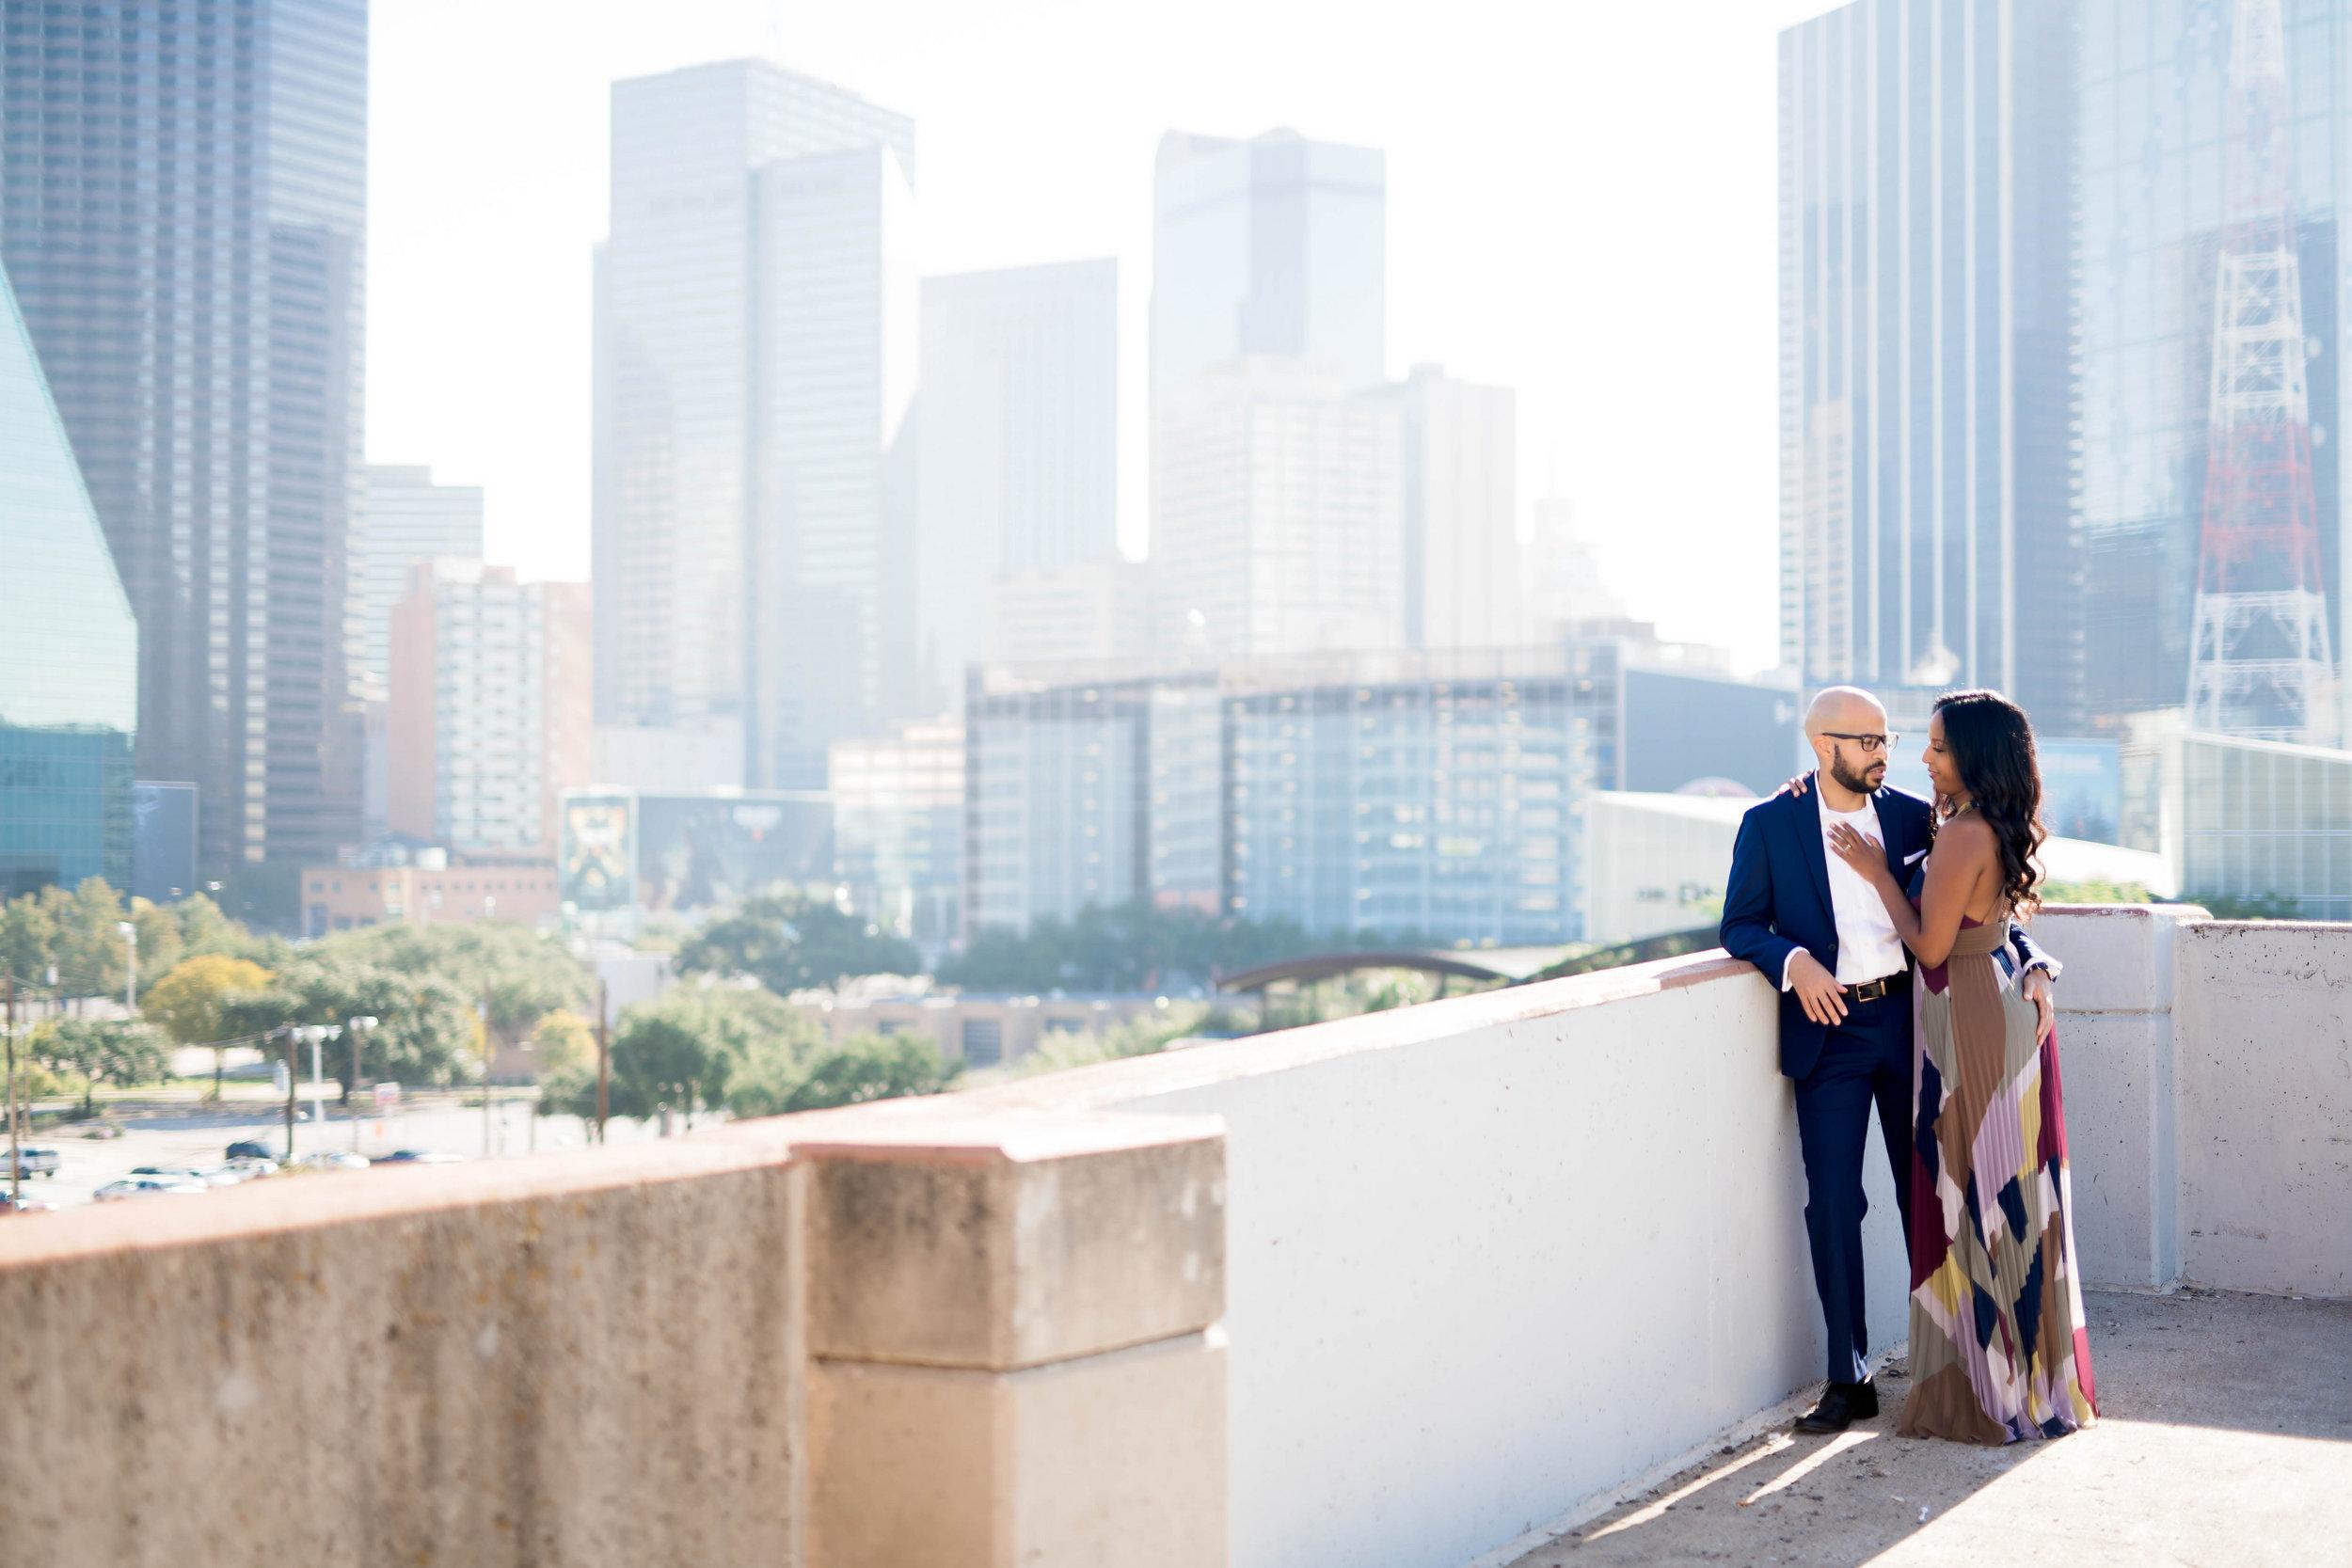 Pharris Photography- Engagement Shoot- Rooftop Engagement- Sophia + Ahmed- Cityscape